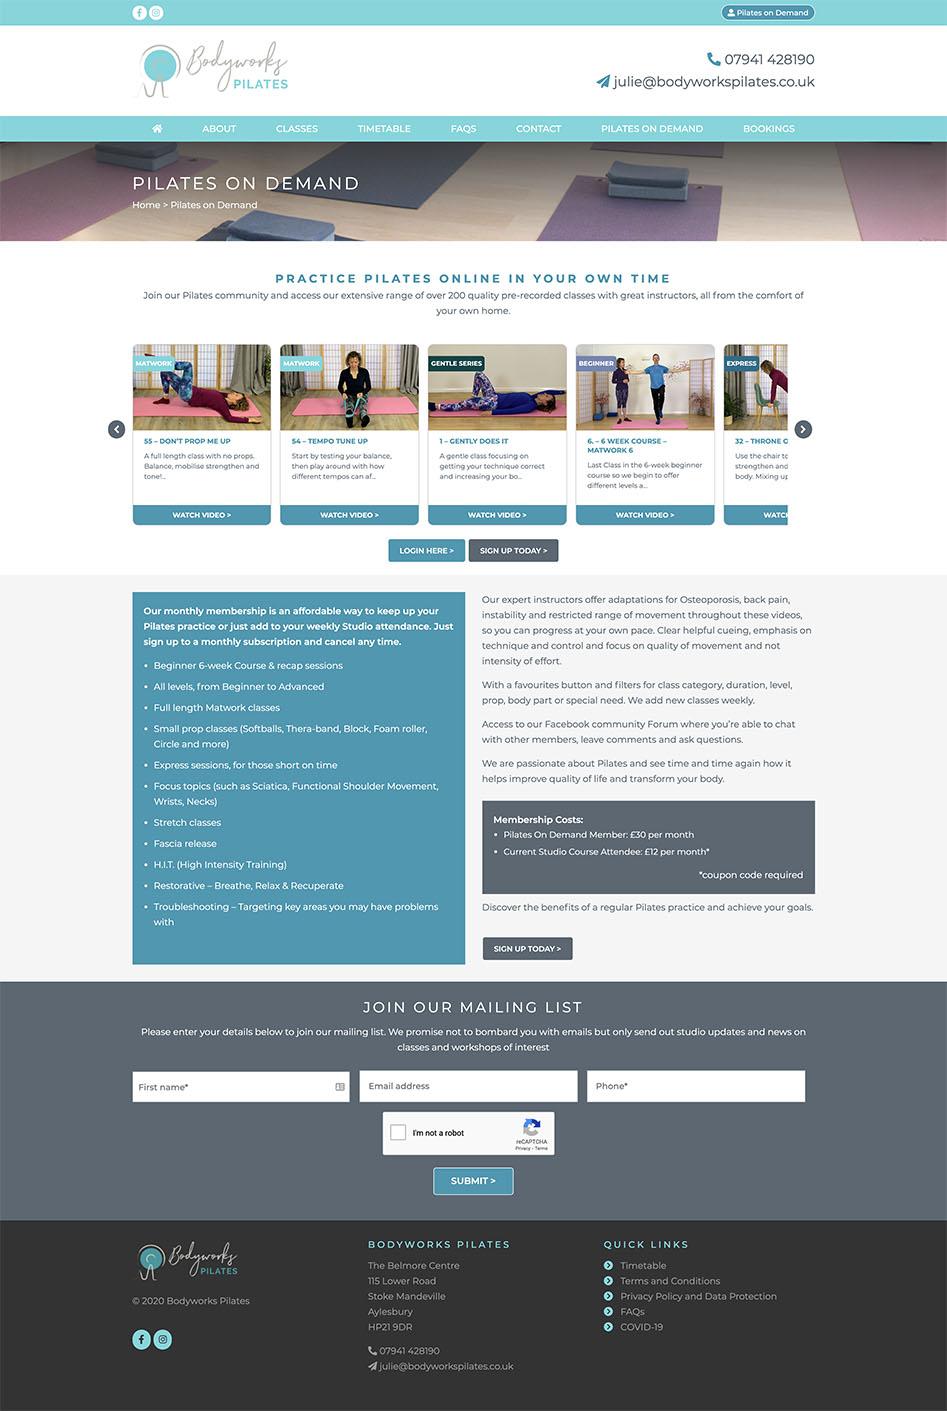 Bodyworks Pilates Login Page